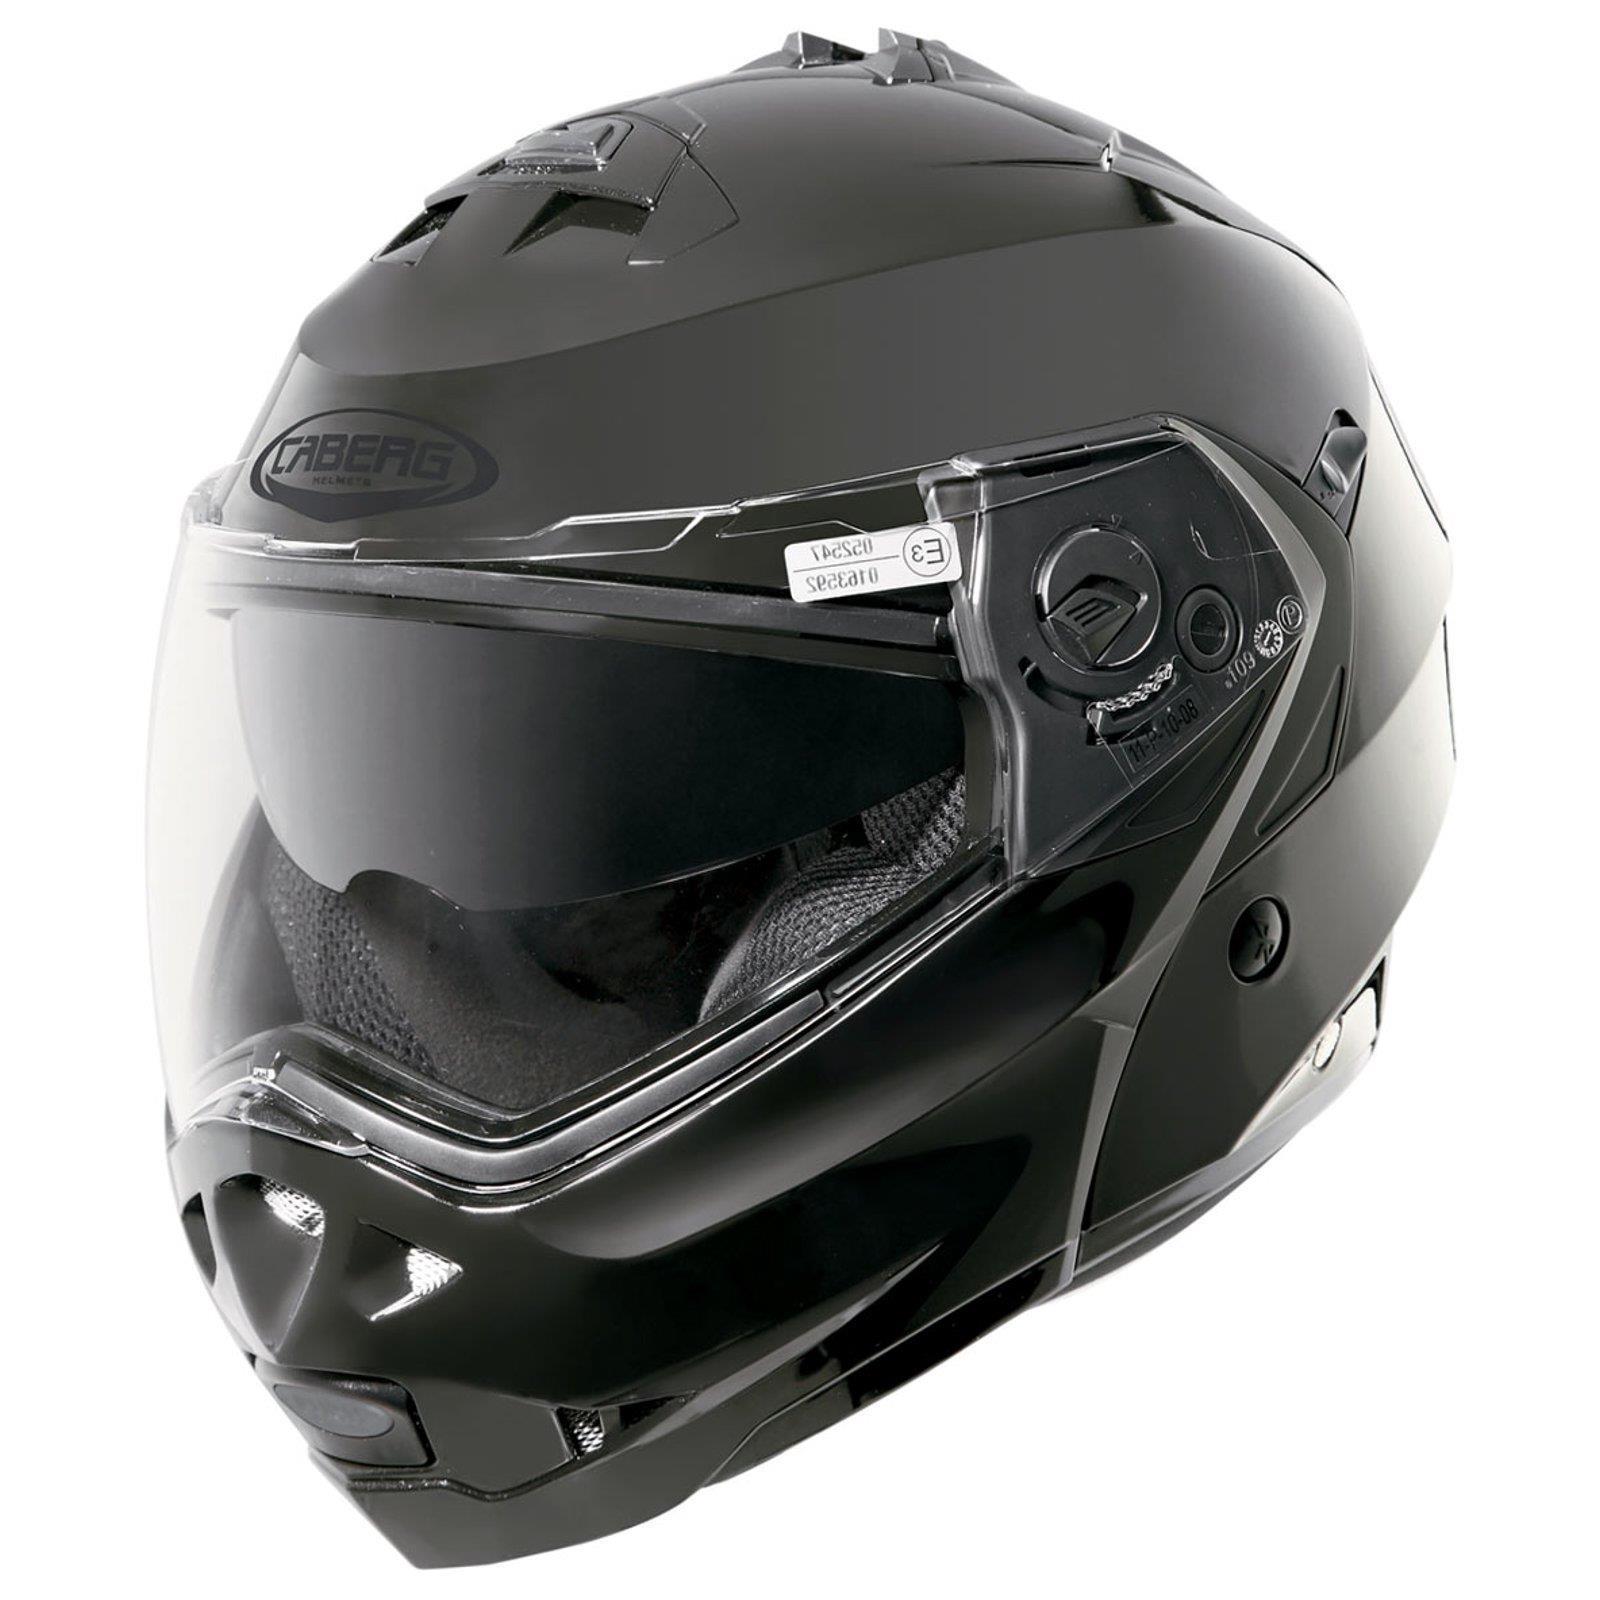 Caberg-Klapp-Helm-Duke-II-2-Smart-Schwarz-Motorrad-Sonnenblende-Pinlock-Jet Indexbild 4